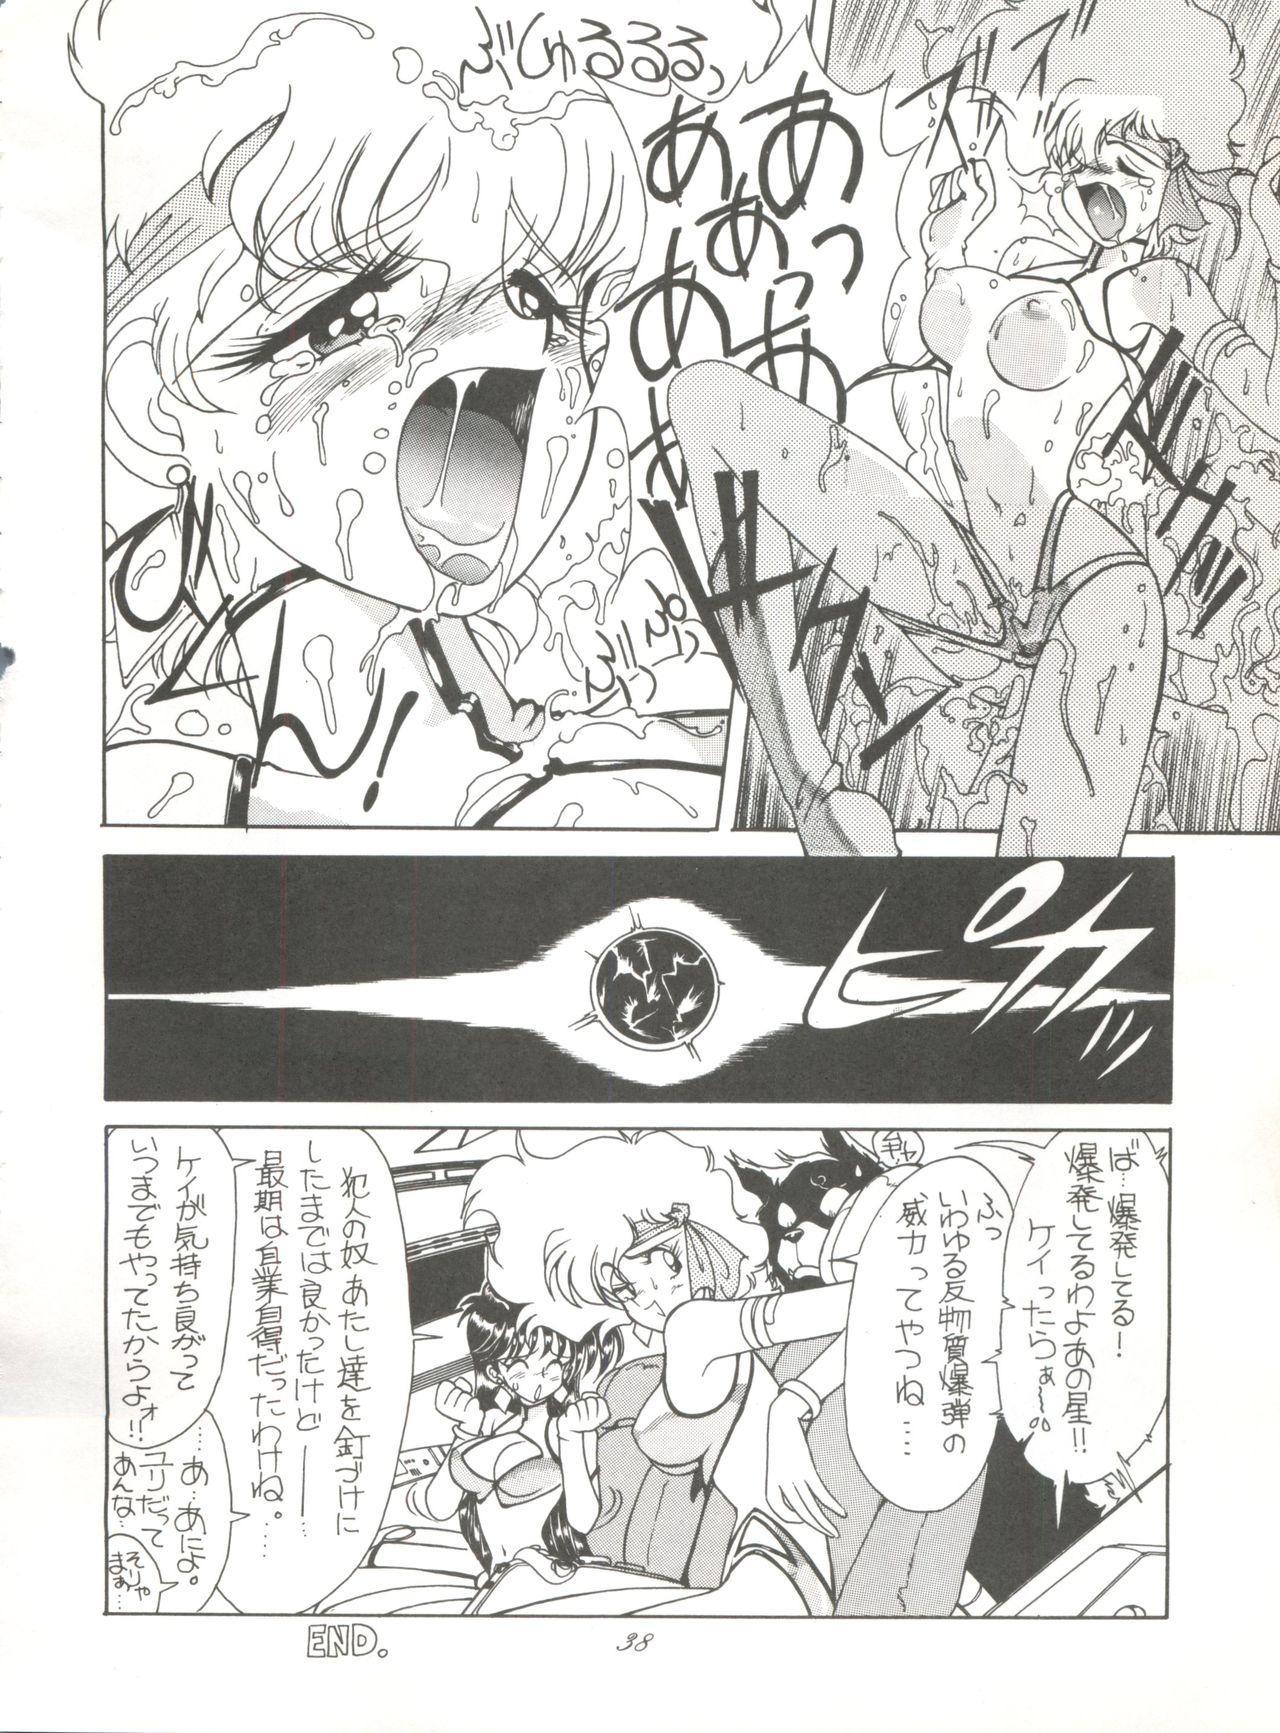 Hara Hara Dokei Vol. 4 Quattro 36